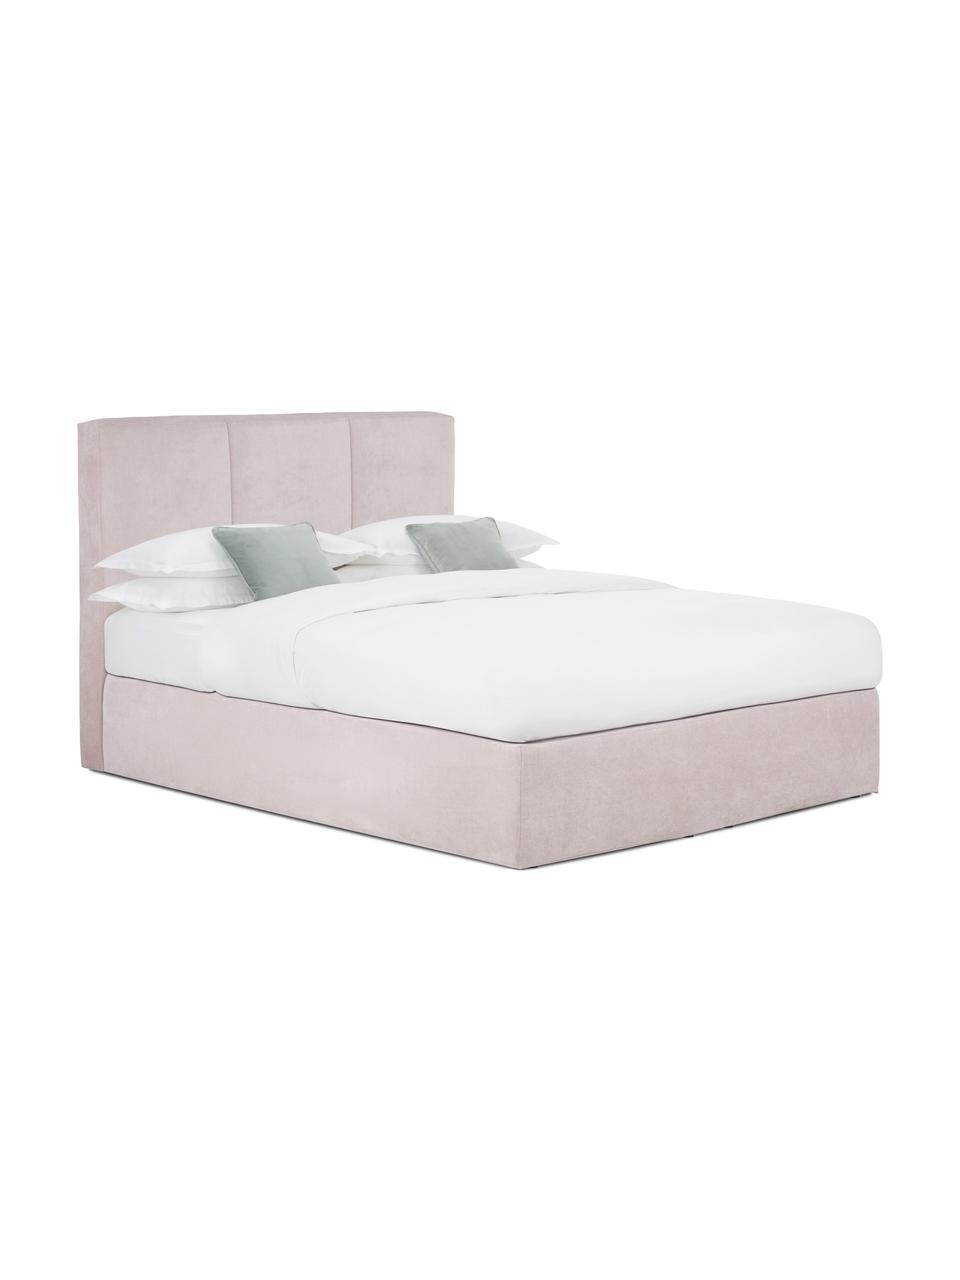 Boxspring bed Oberon in roze, Matras: 5-zones pocketvering, Poten: kunststof, Stof roze, 200 x 200 cm